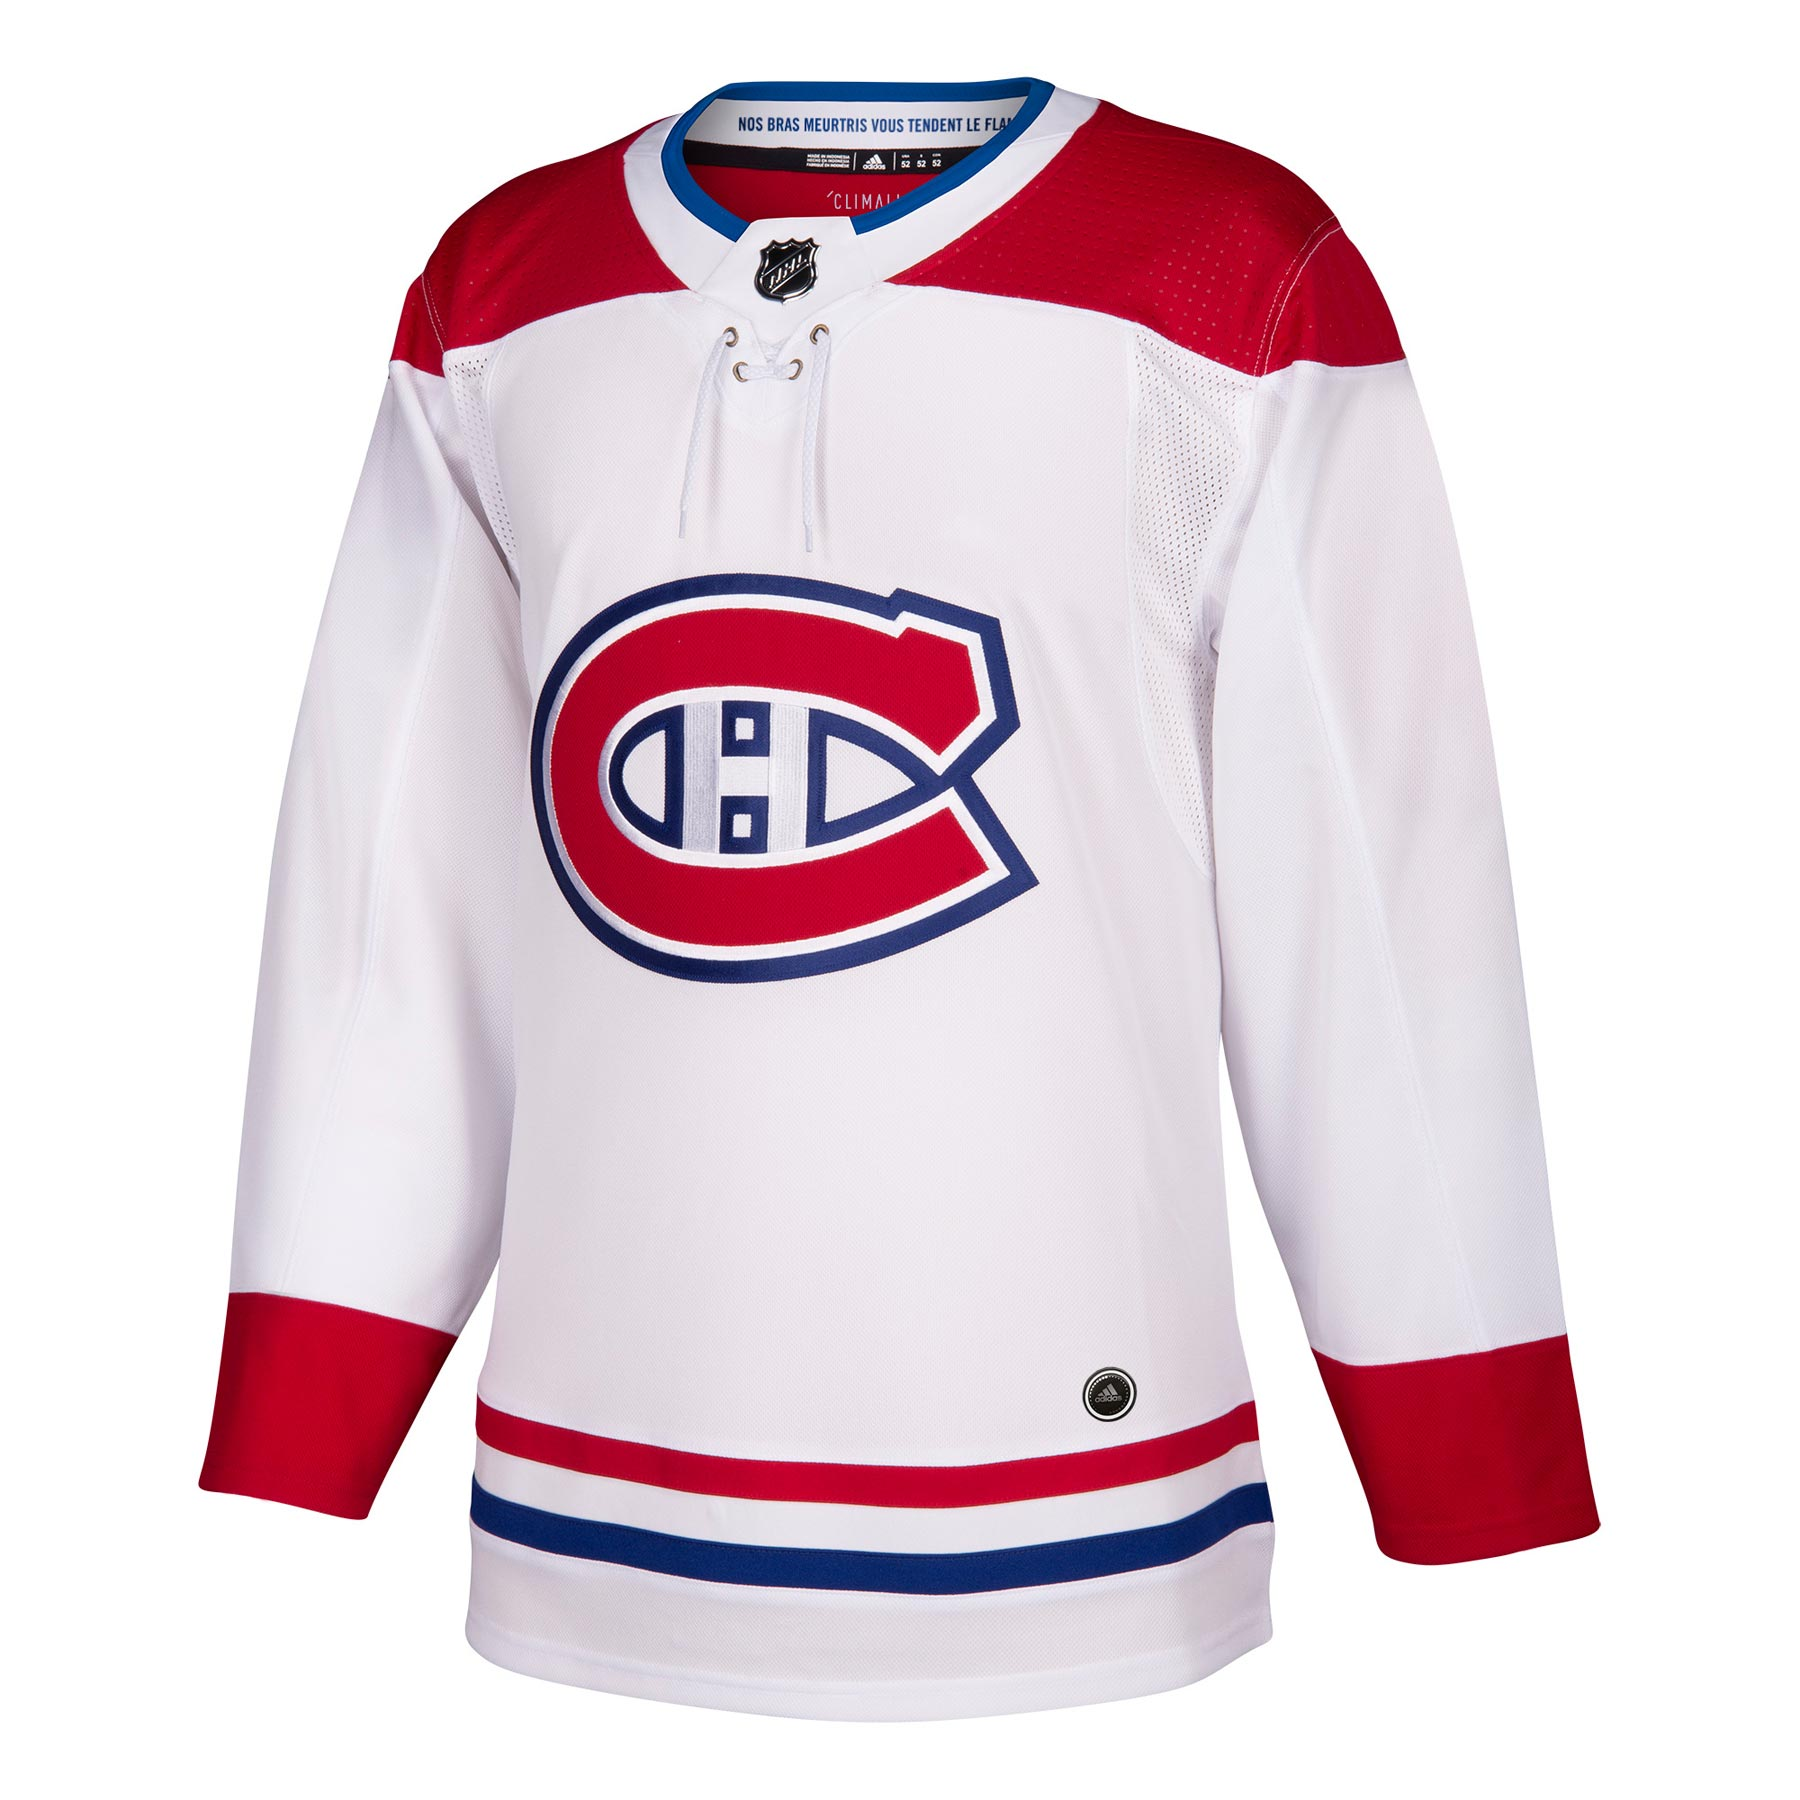 Montreal Canadiens Adidas Authentic Jersey Away ADIZERO e333b0ede84